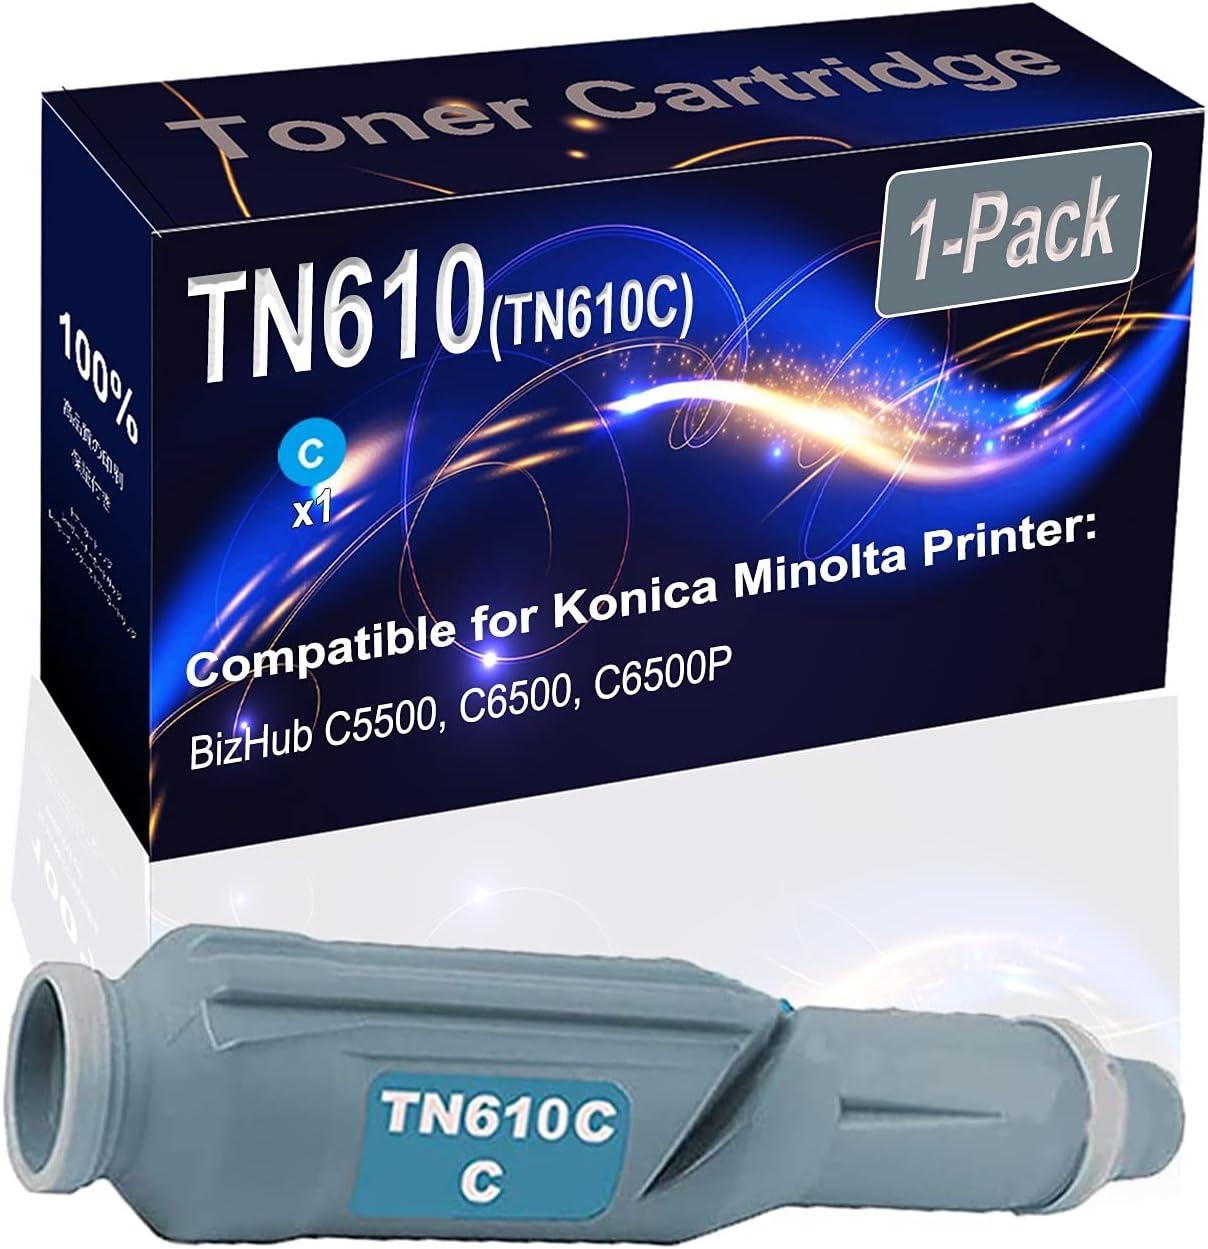 1-Pack (Cyan) Compatible High Yield TN610 (TN610C) Printer Toner Cartridge use for Konica Minolta BizHub C5500 C6500 Printers